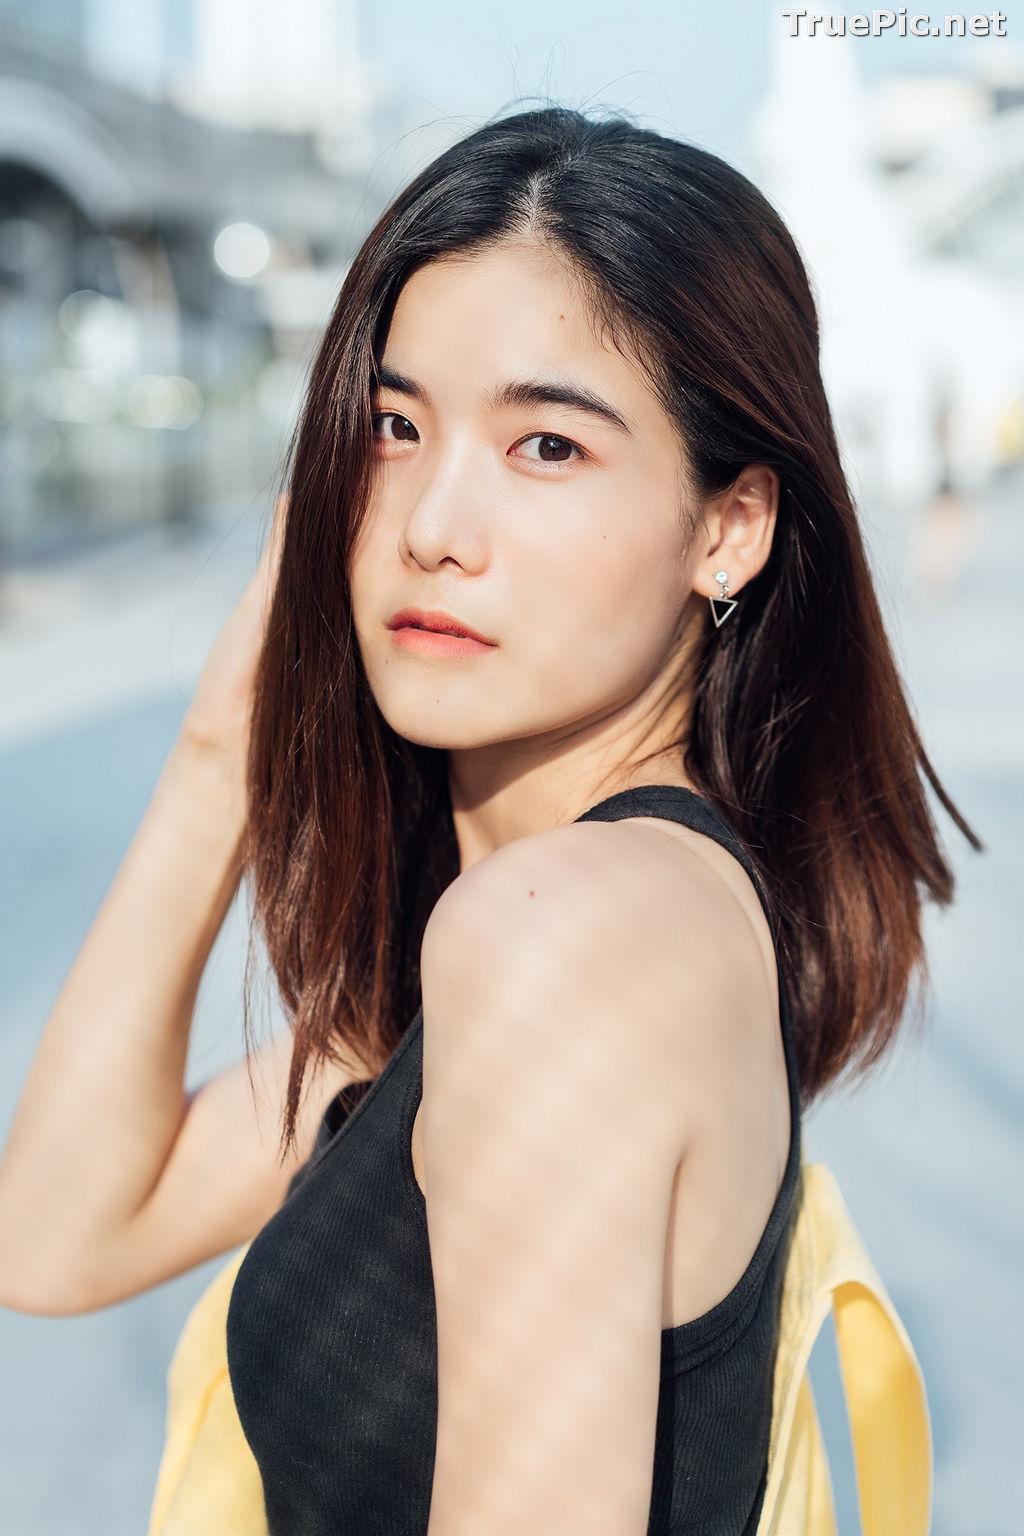 Image Thailand Model - Chanokneth Yospanya - Love Minions - TruePic.net - Picture-6